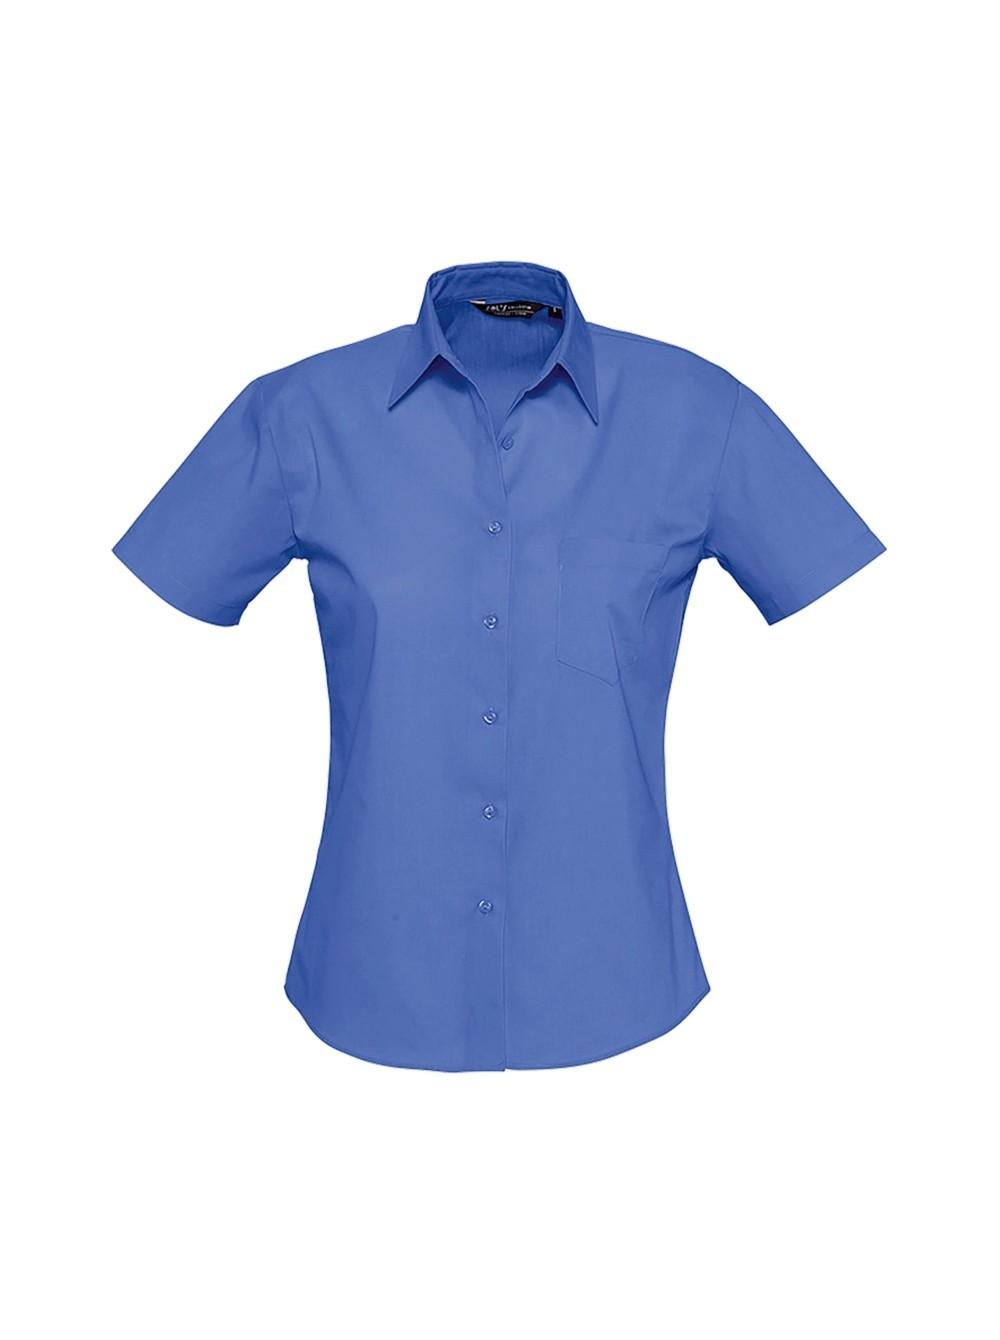 6e3bc566a34 Рубашка женская с коротким рукавом ENERGY кобальт Sol s купить оптом ...